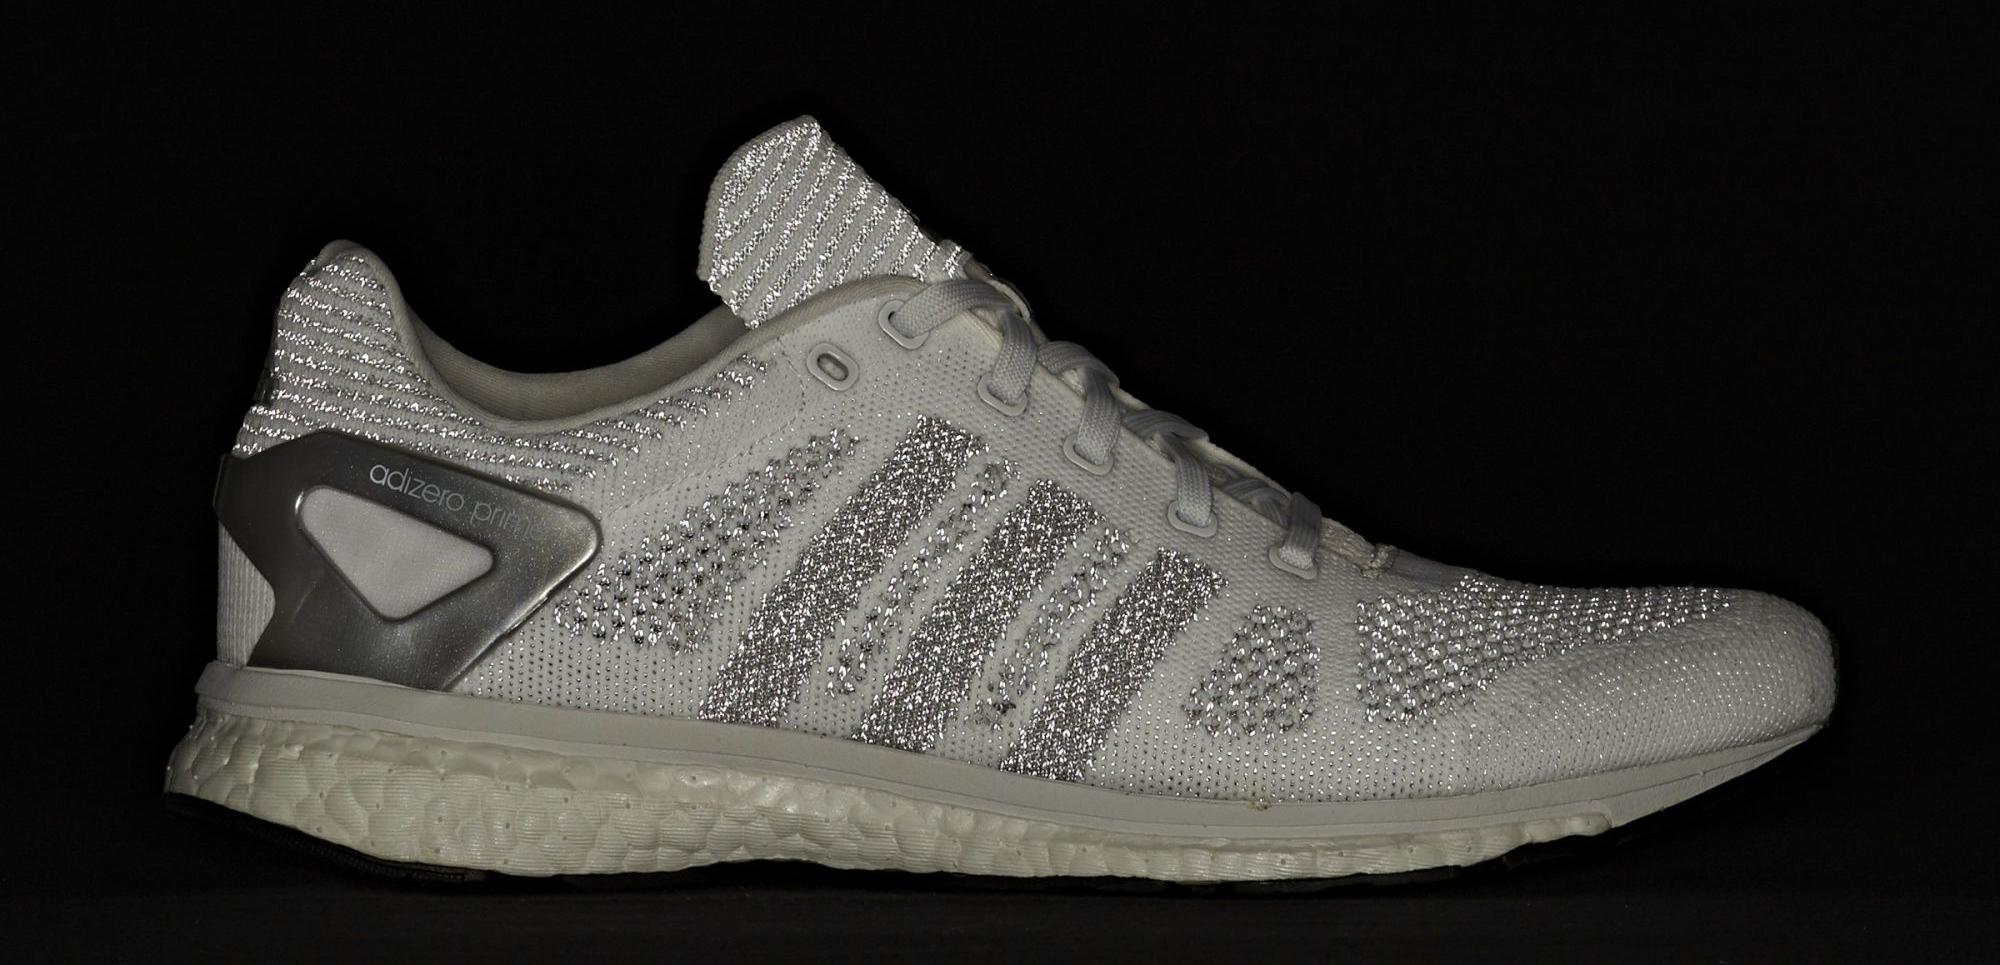 Adidas Adizero Primeknit White Reflective Flash